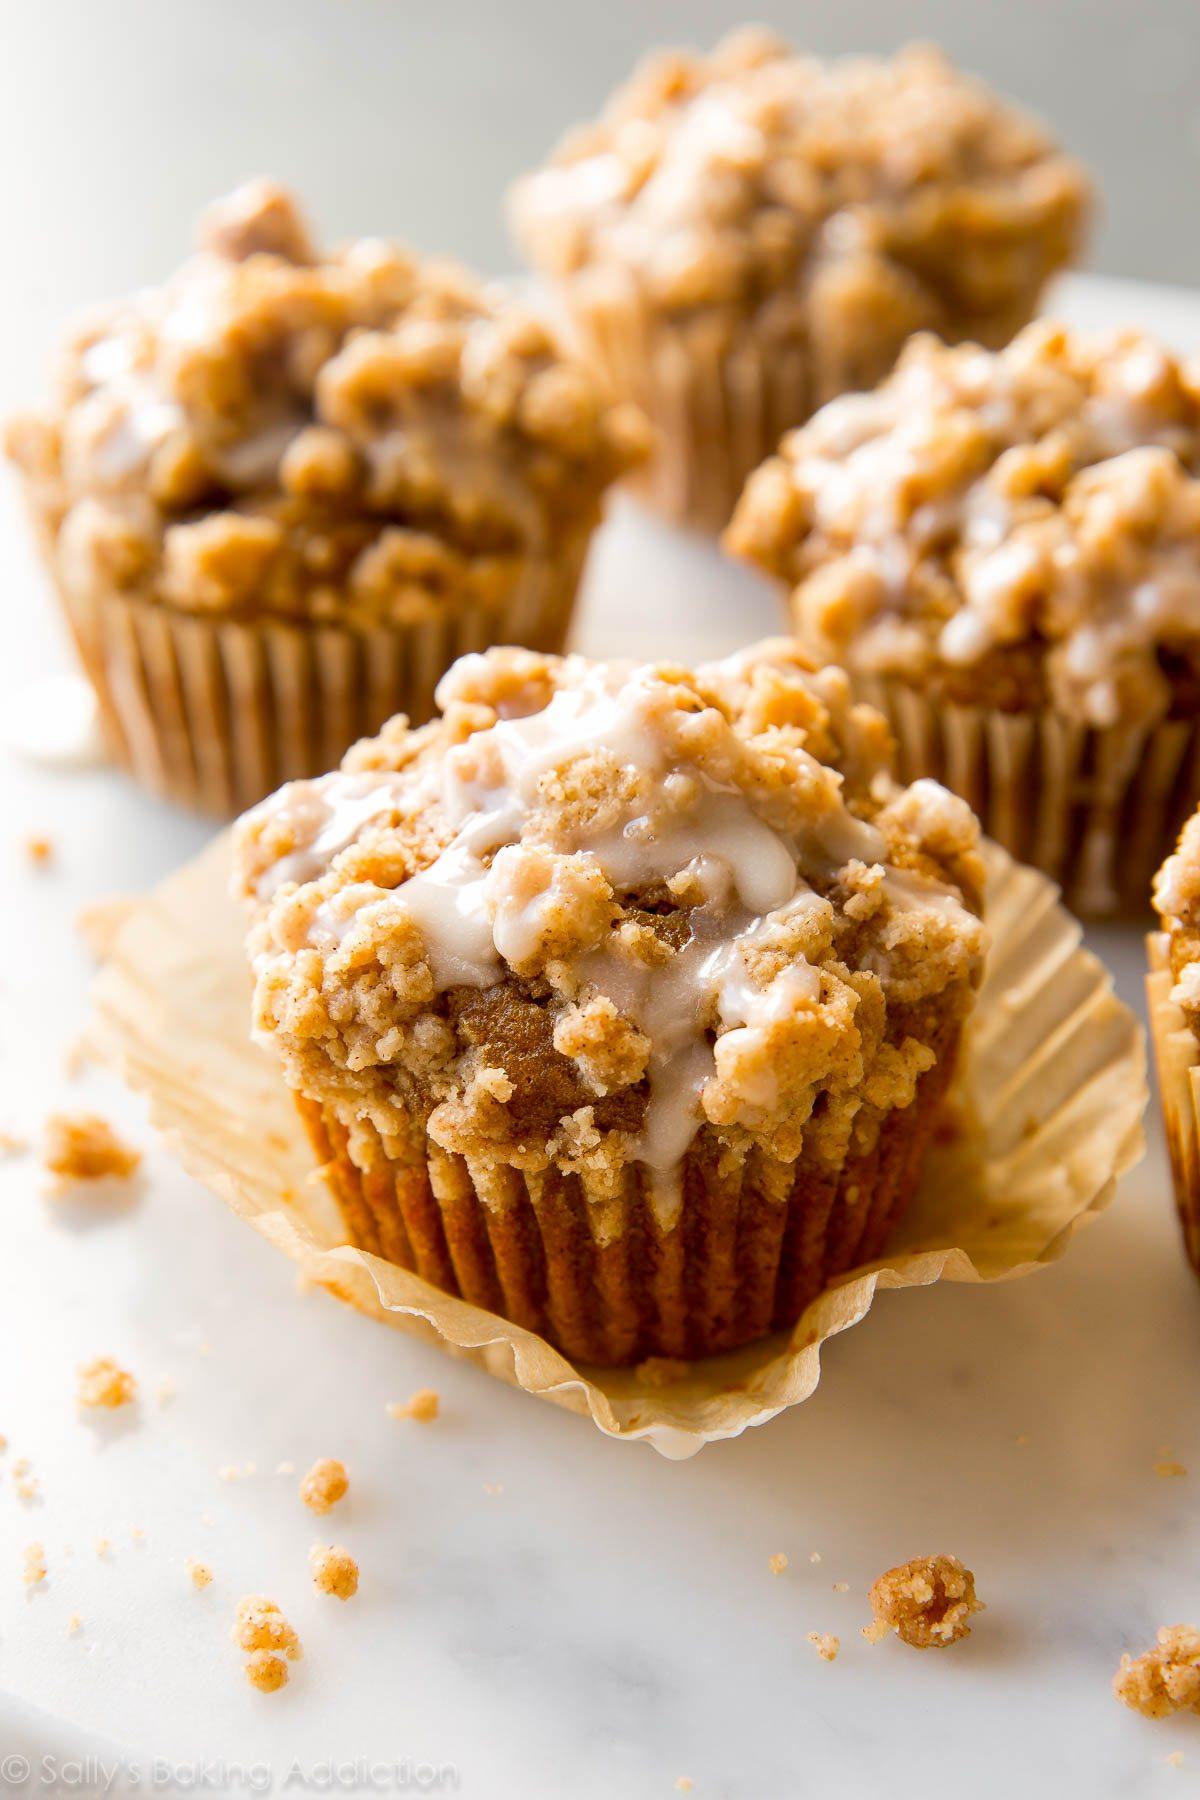 https://sallysbakingaddiction.com/2016/09/30/pumpkin-crumb-cake-muffins/